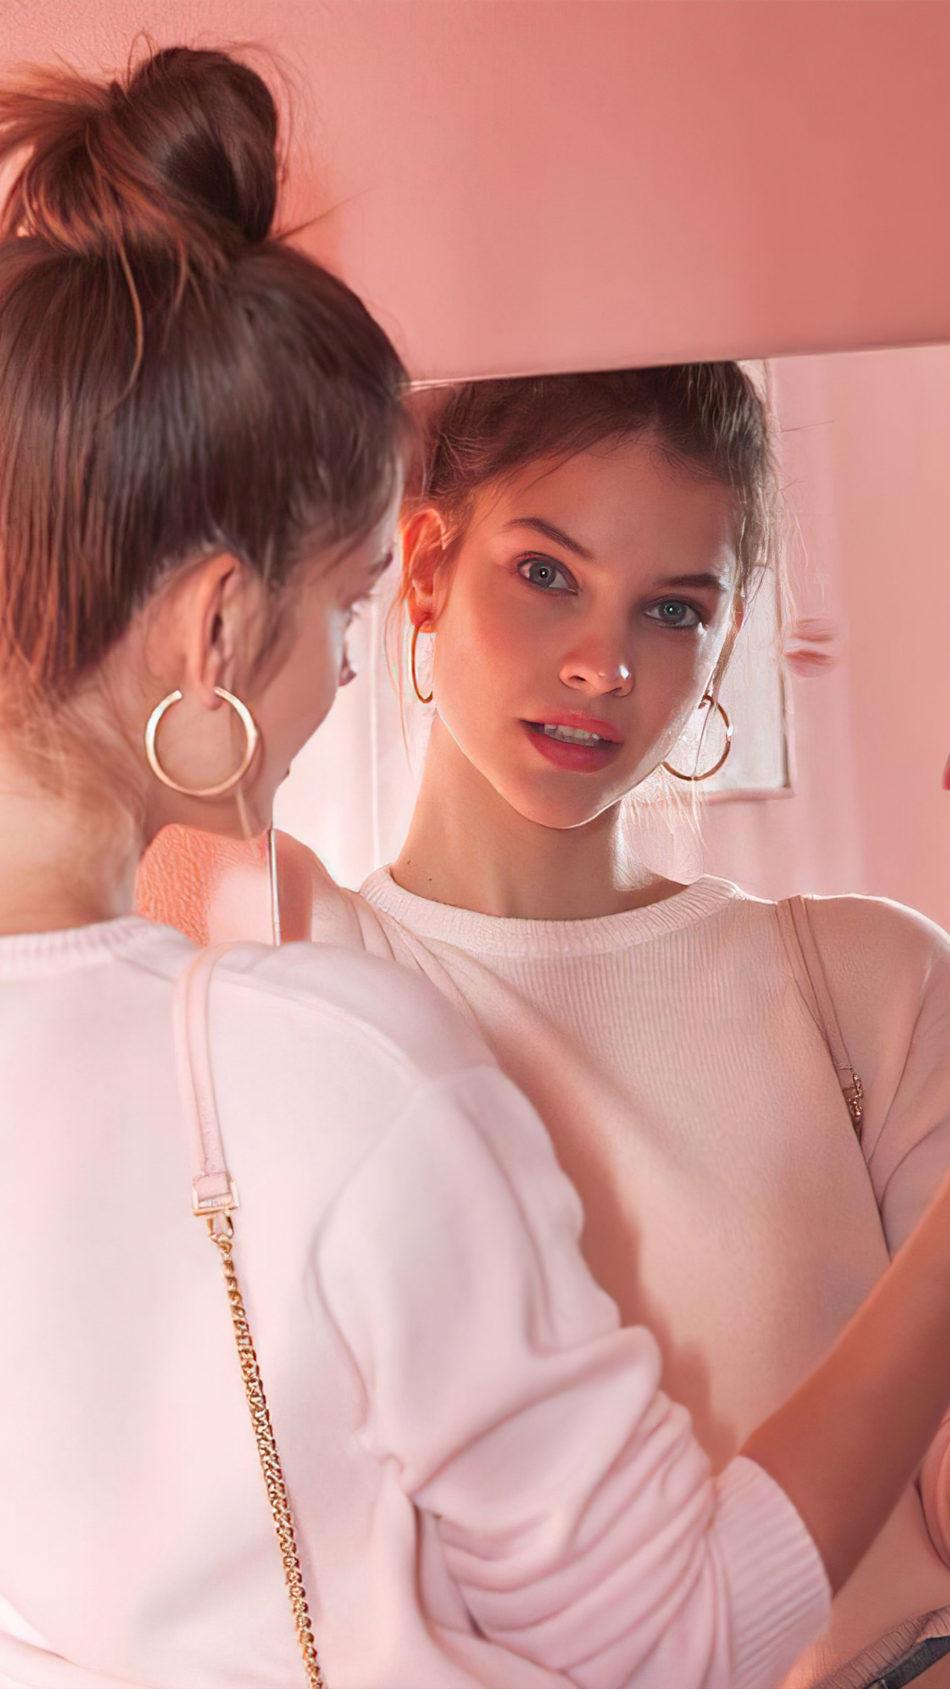 Barbara Palvin Mirror Reflection Photoshoot 4K Ultra HD Mobile Wallpaper